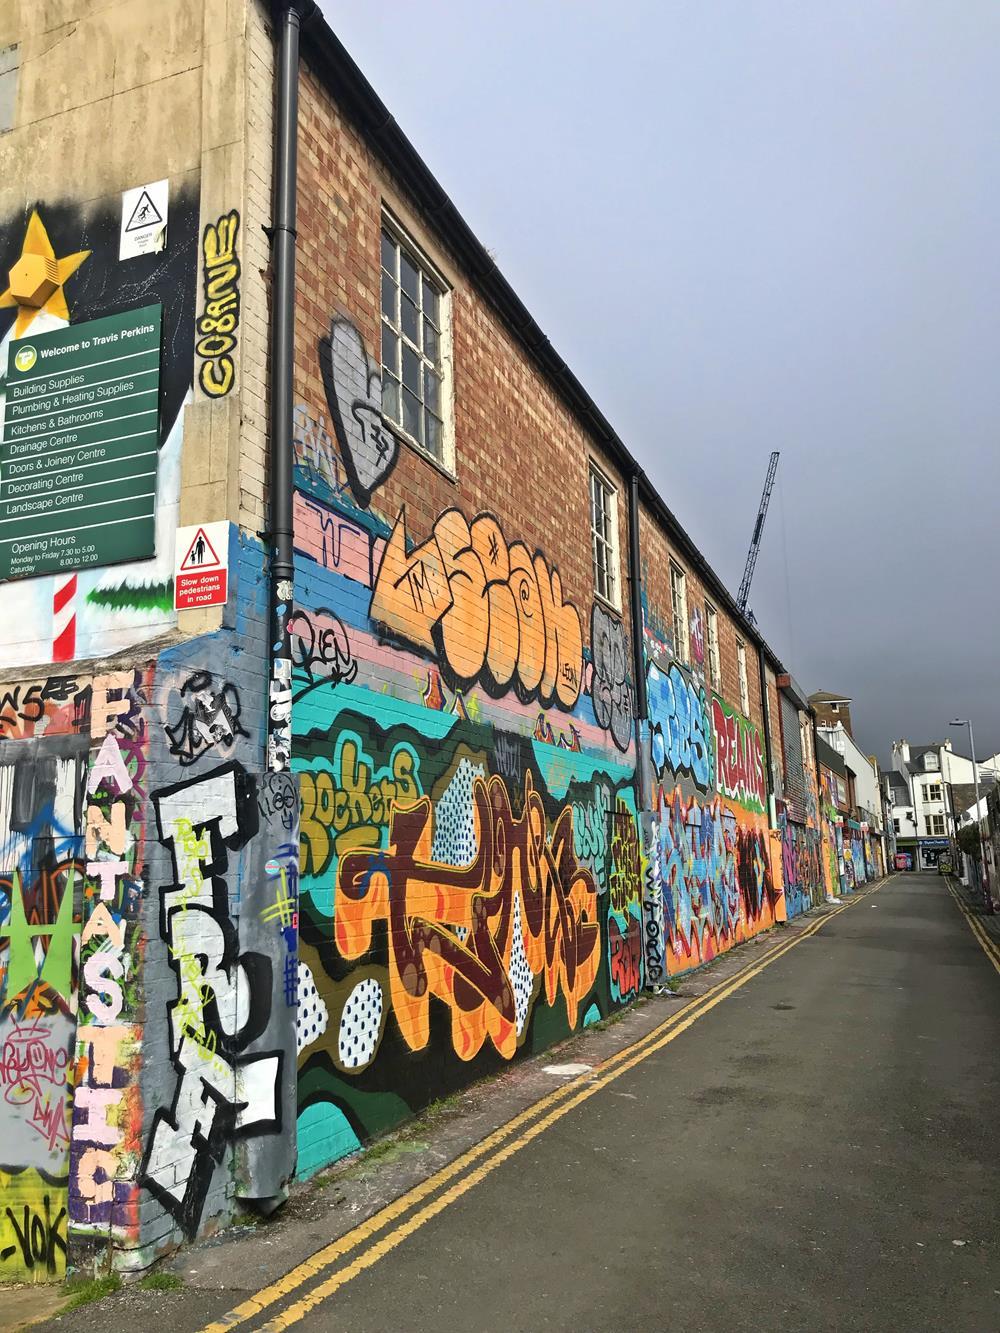 Trafalgar Lane is one of the best locations for Brighton street art